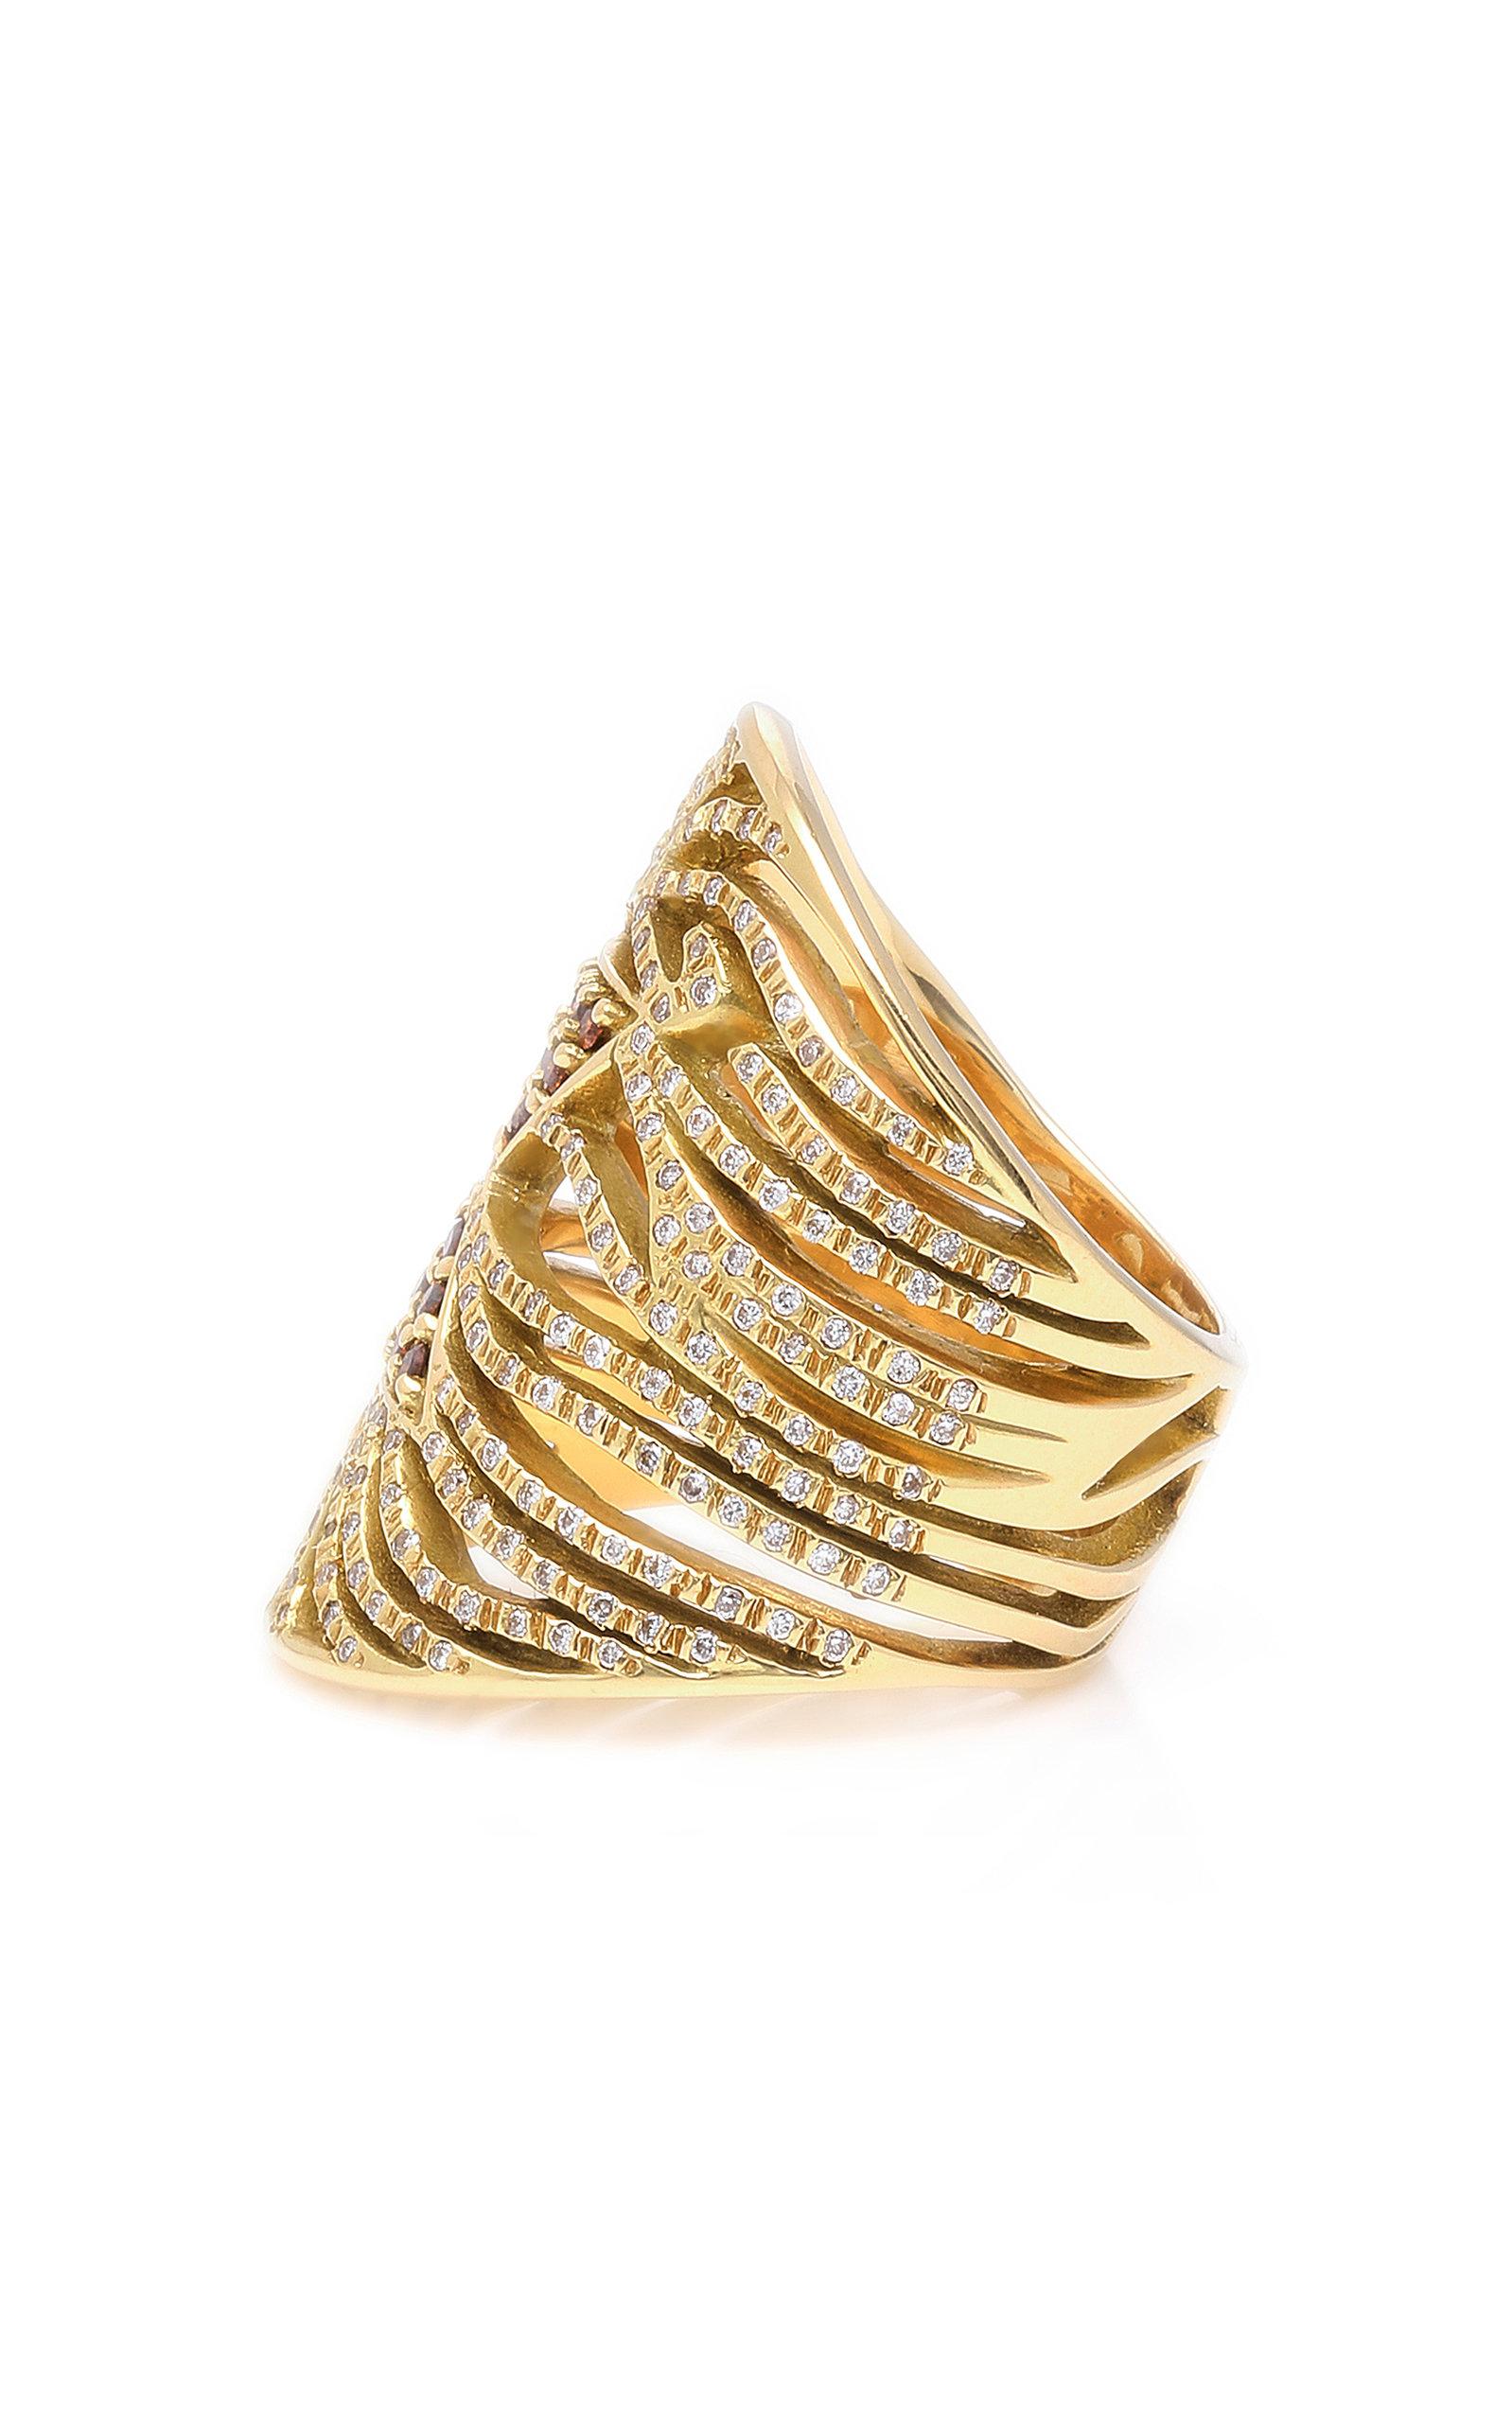 Usama 18K Gold Diamond Ring Misahara MYJHwpe